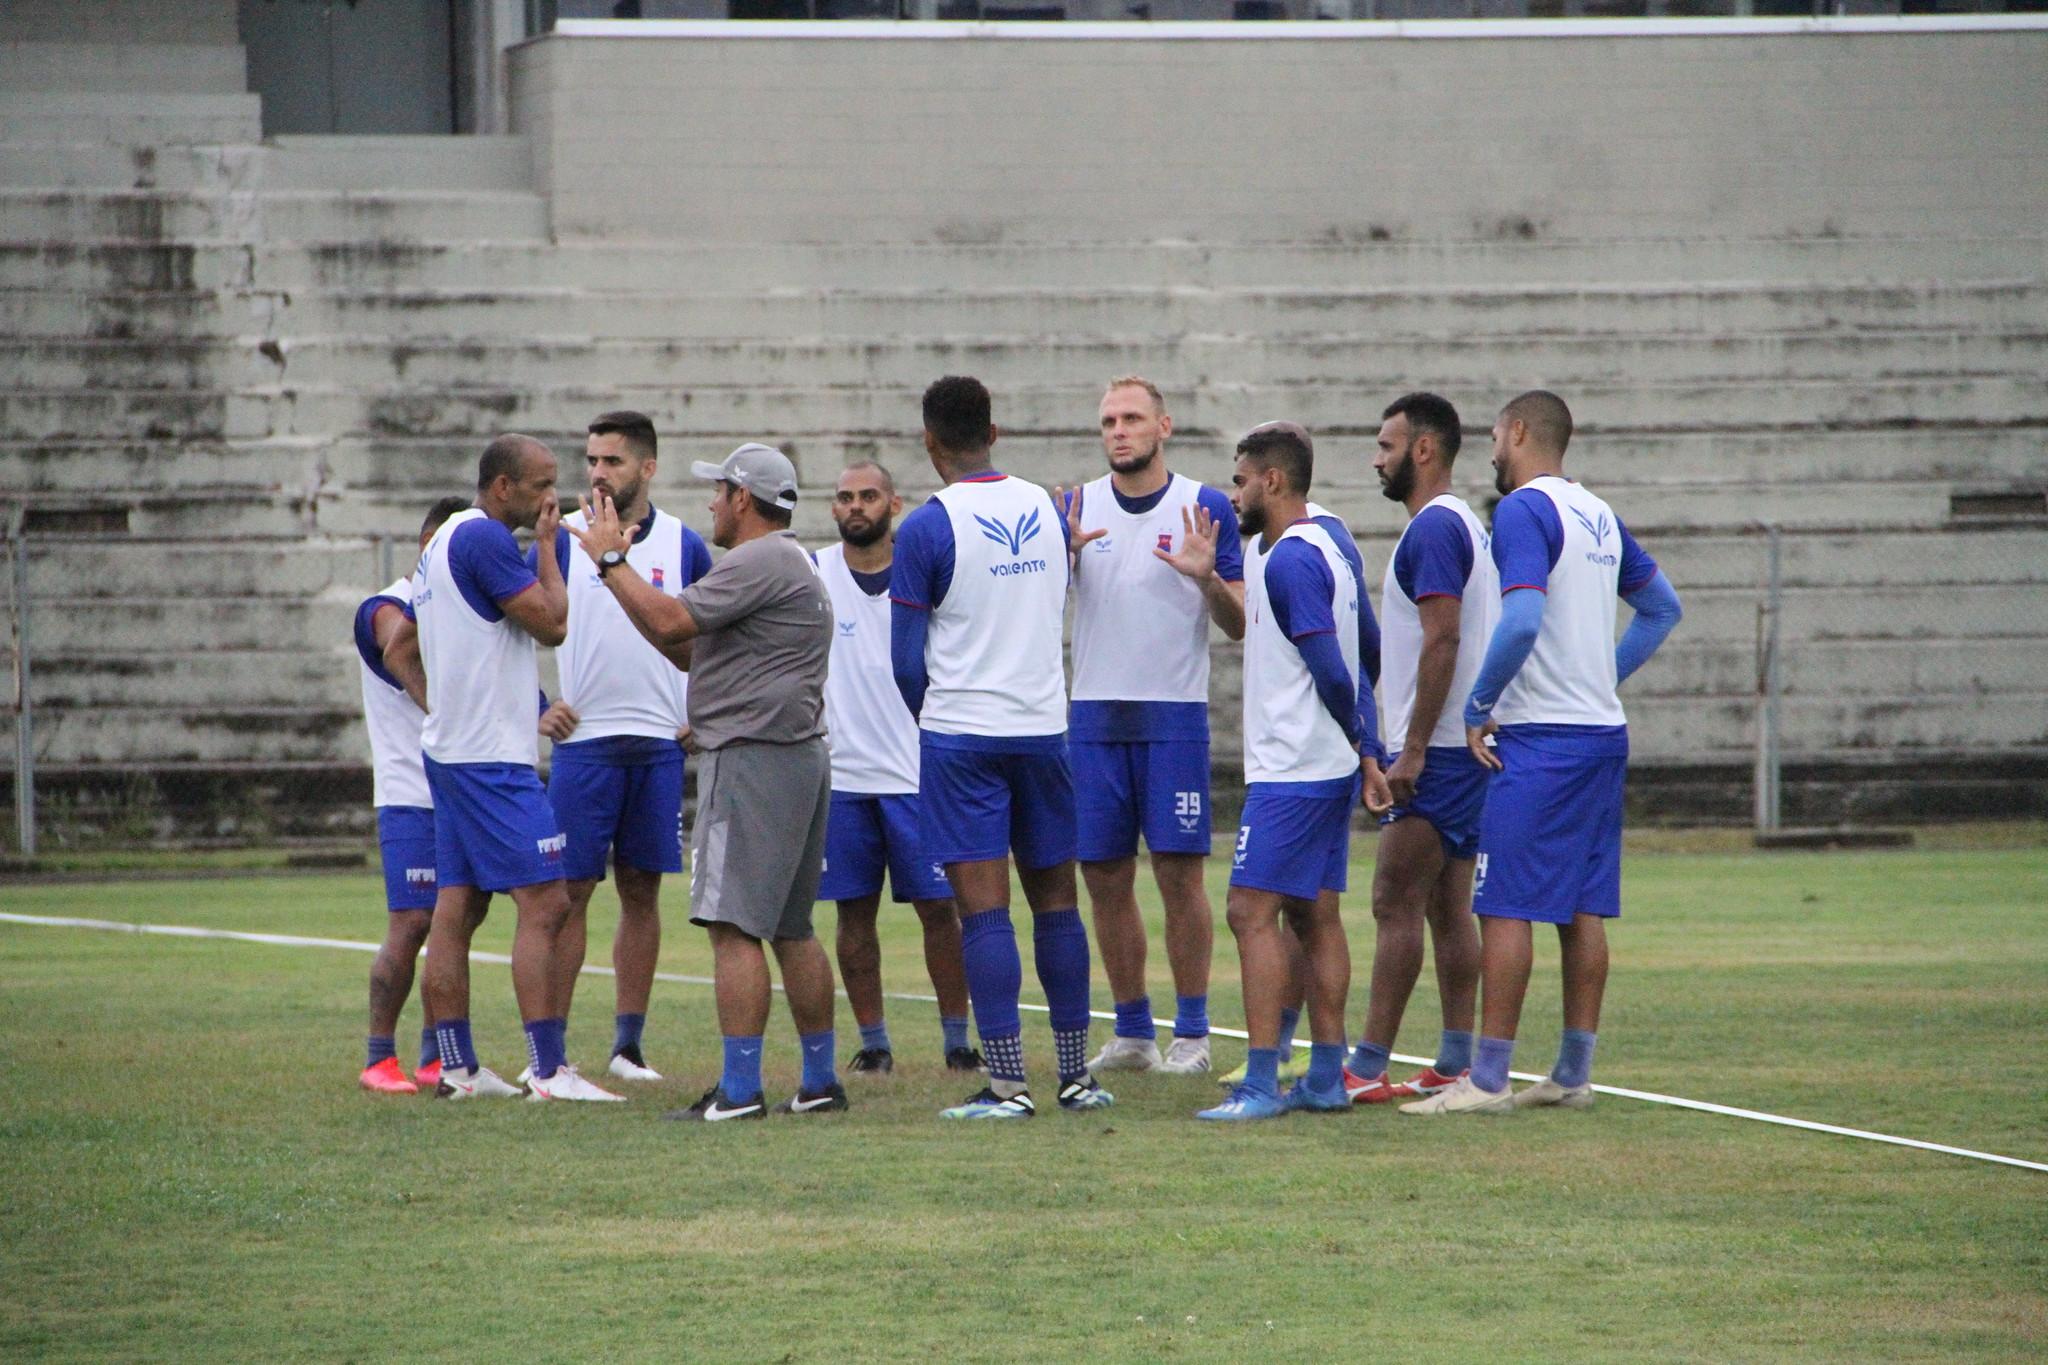 Maurílio orienta elenco durante treino na Vila Capanema. Foto: Rui Santos/Paraná.